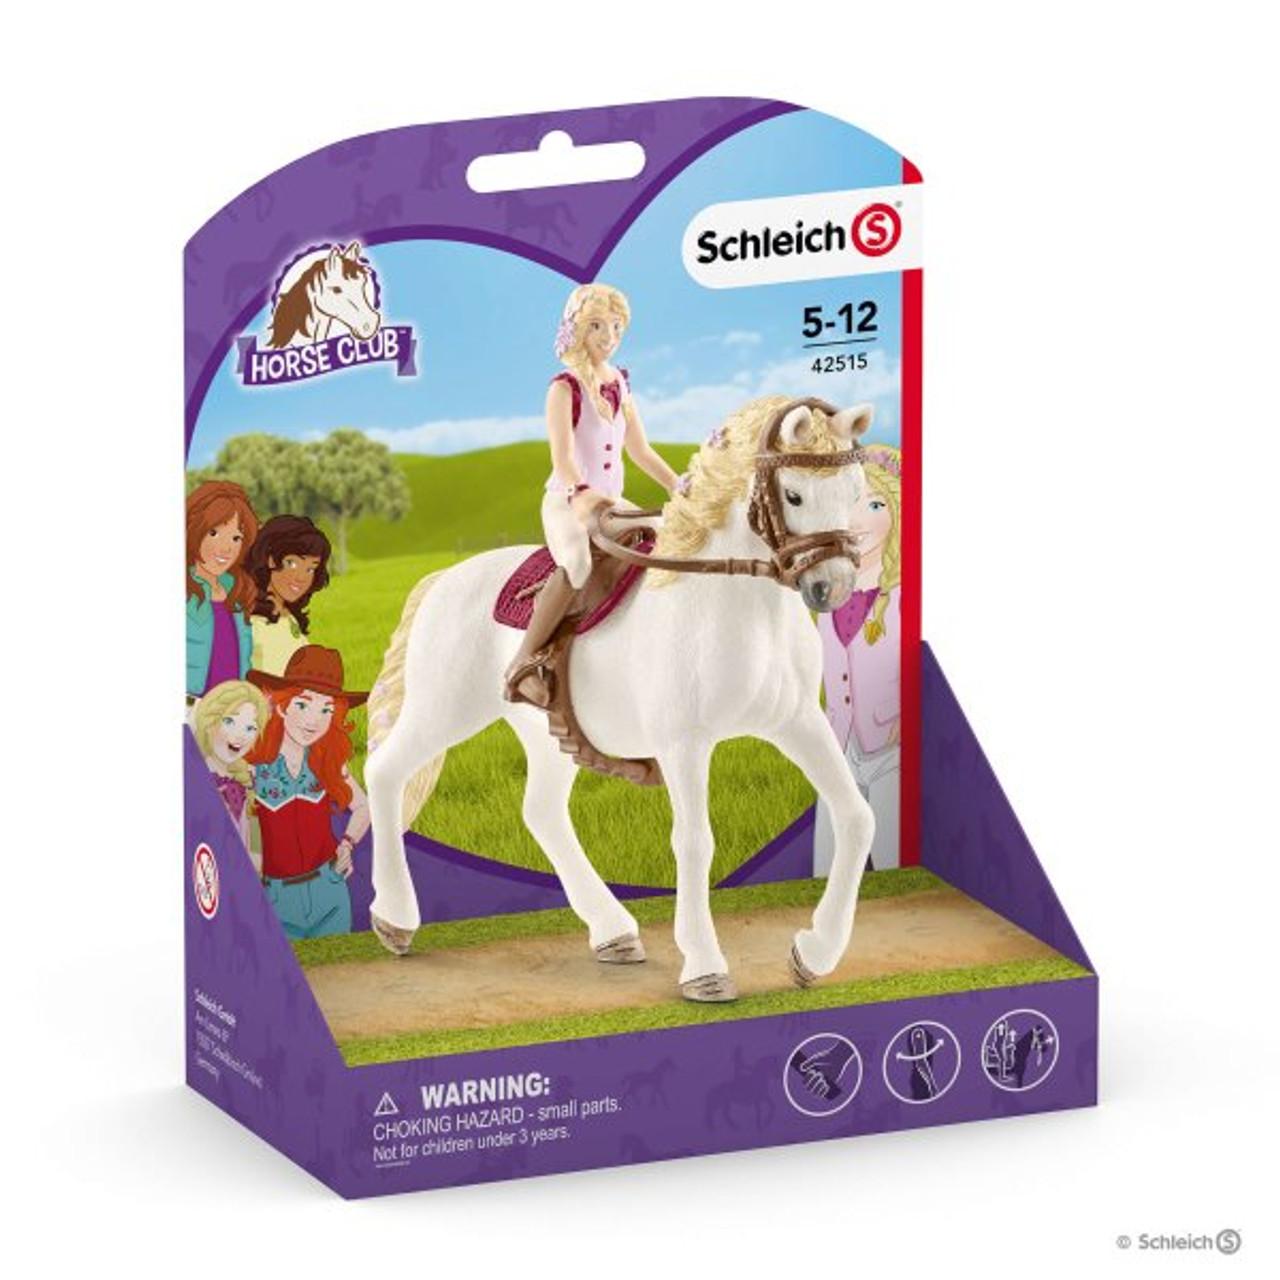 Schleich 42518 horse club Mia /& Spotty